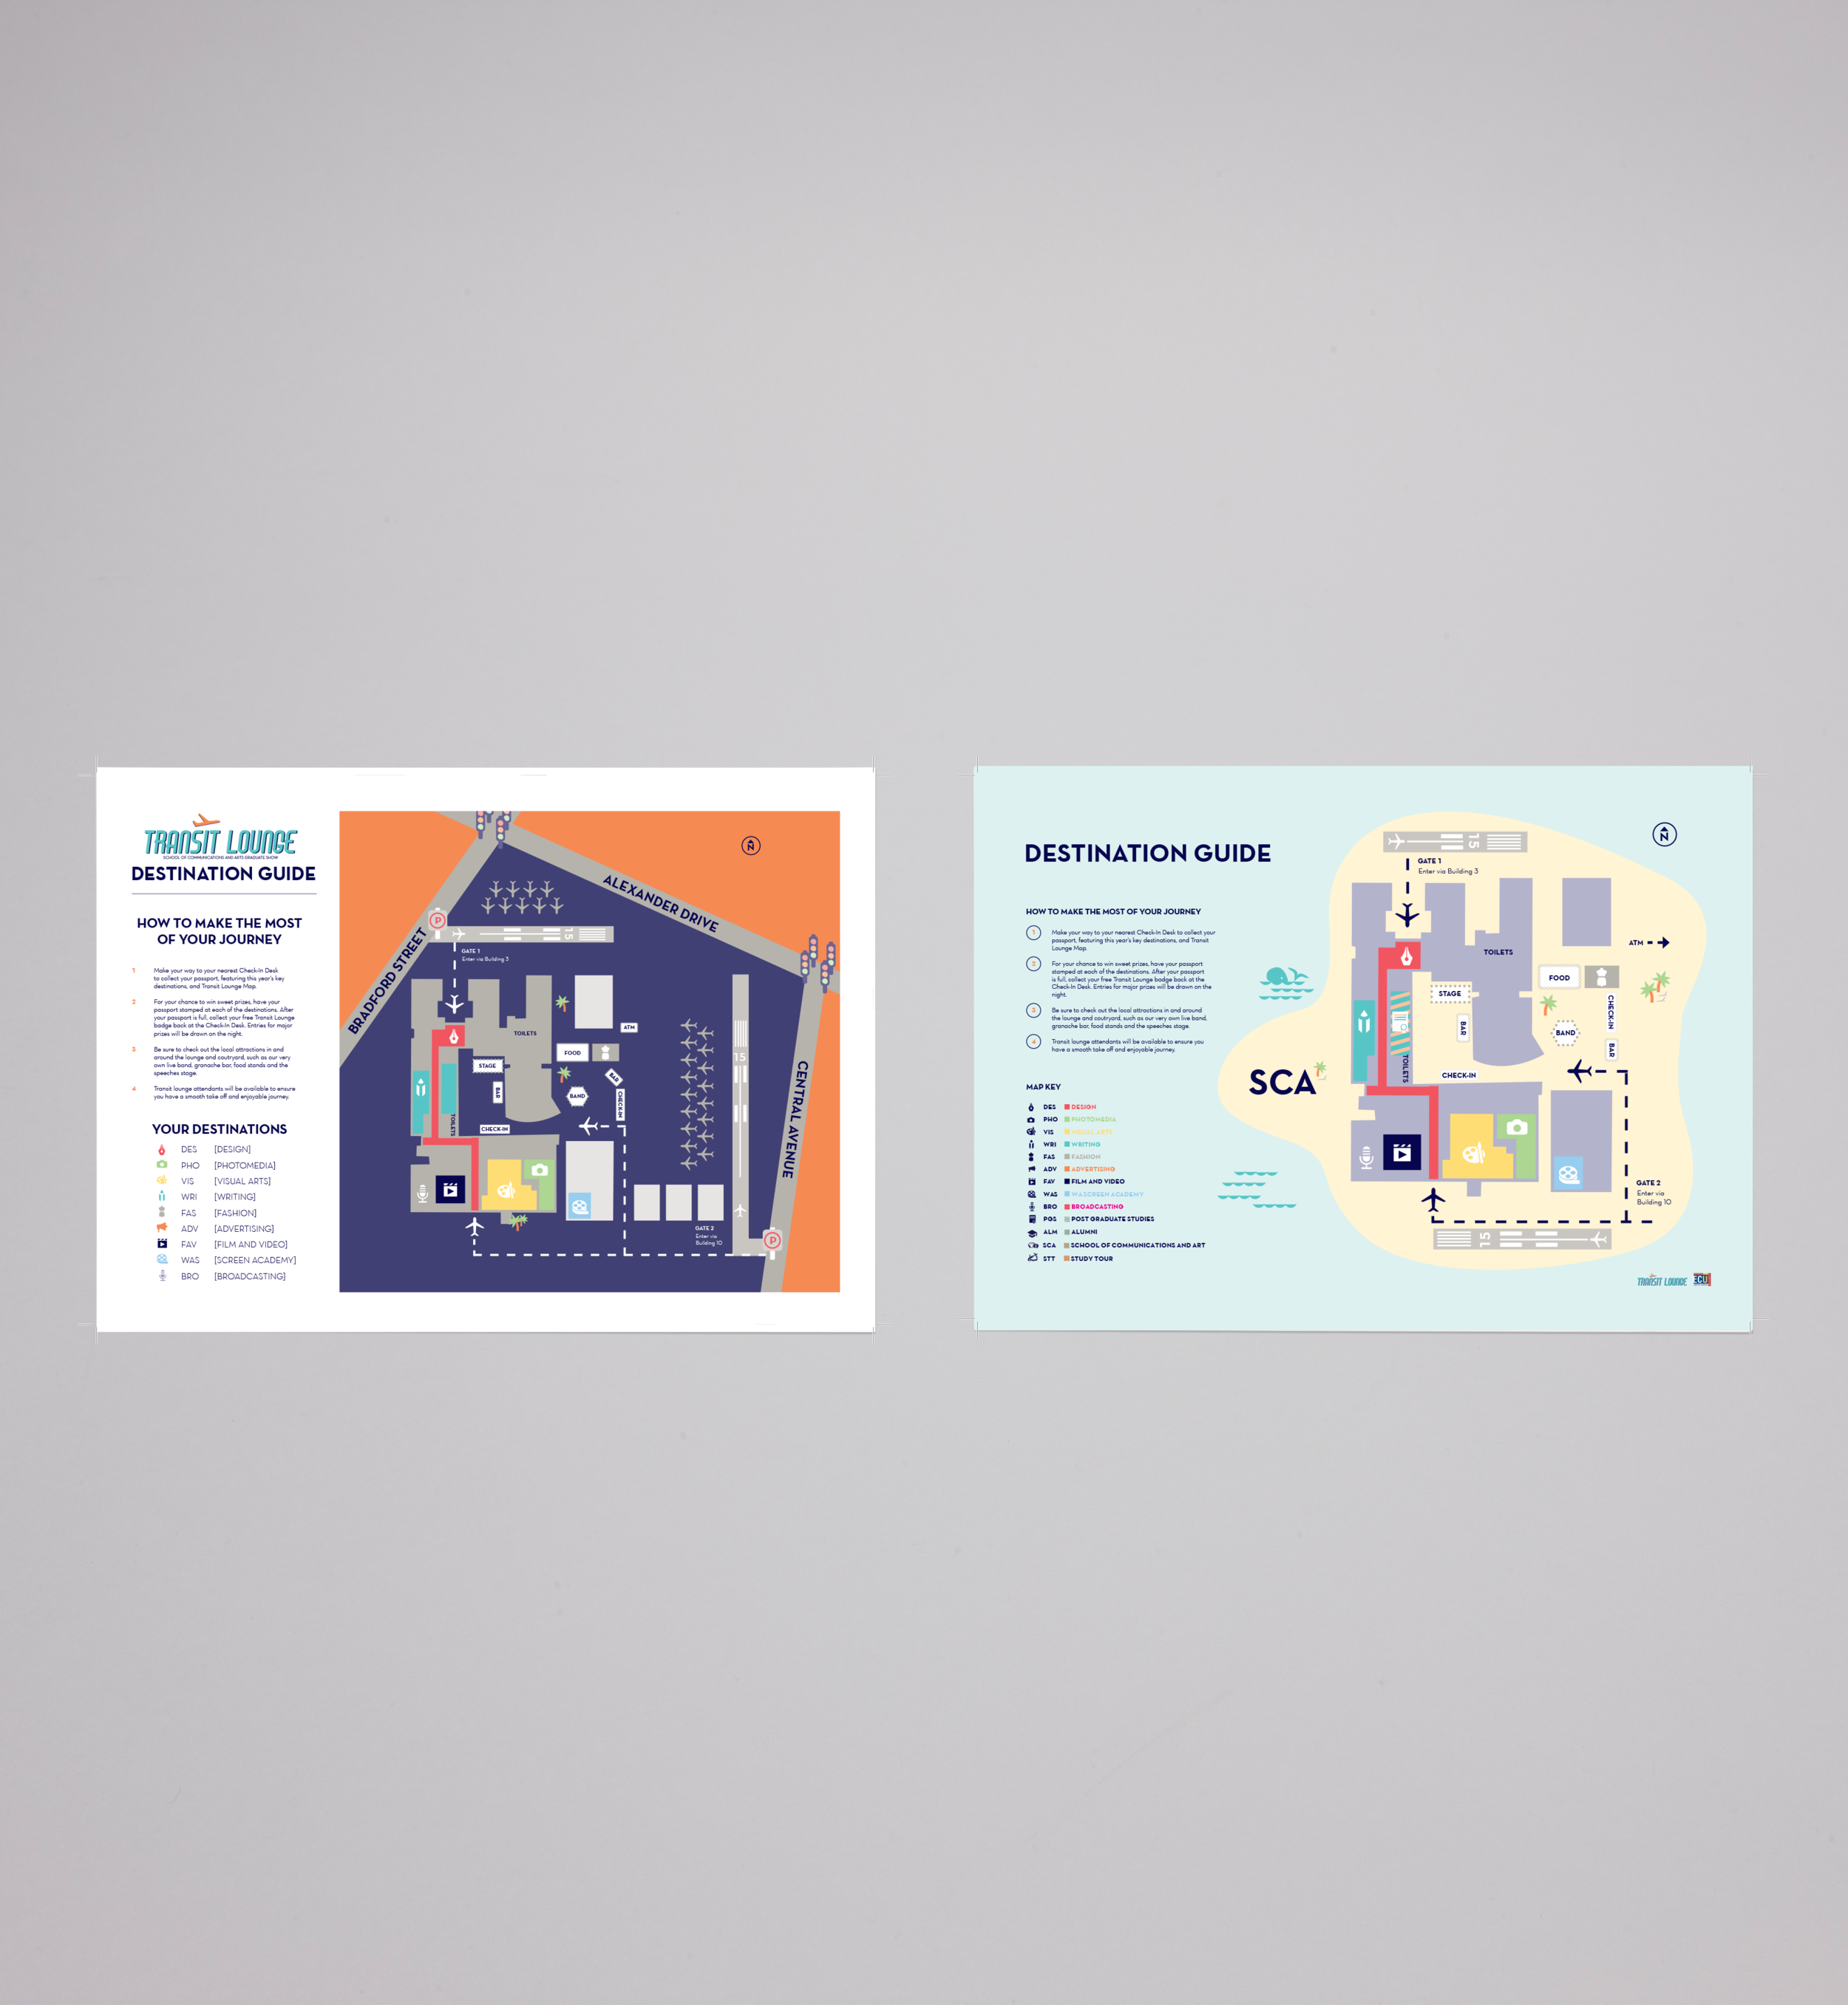 Flier Mockup - Transit Lounge Map 1.png